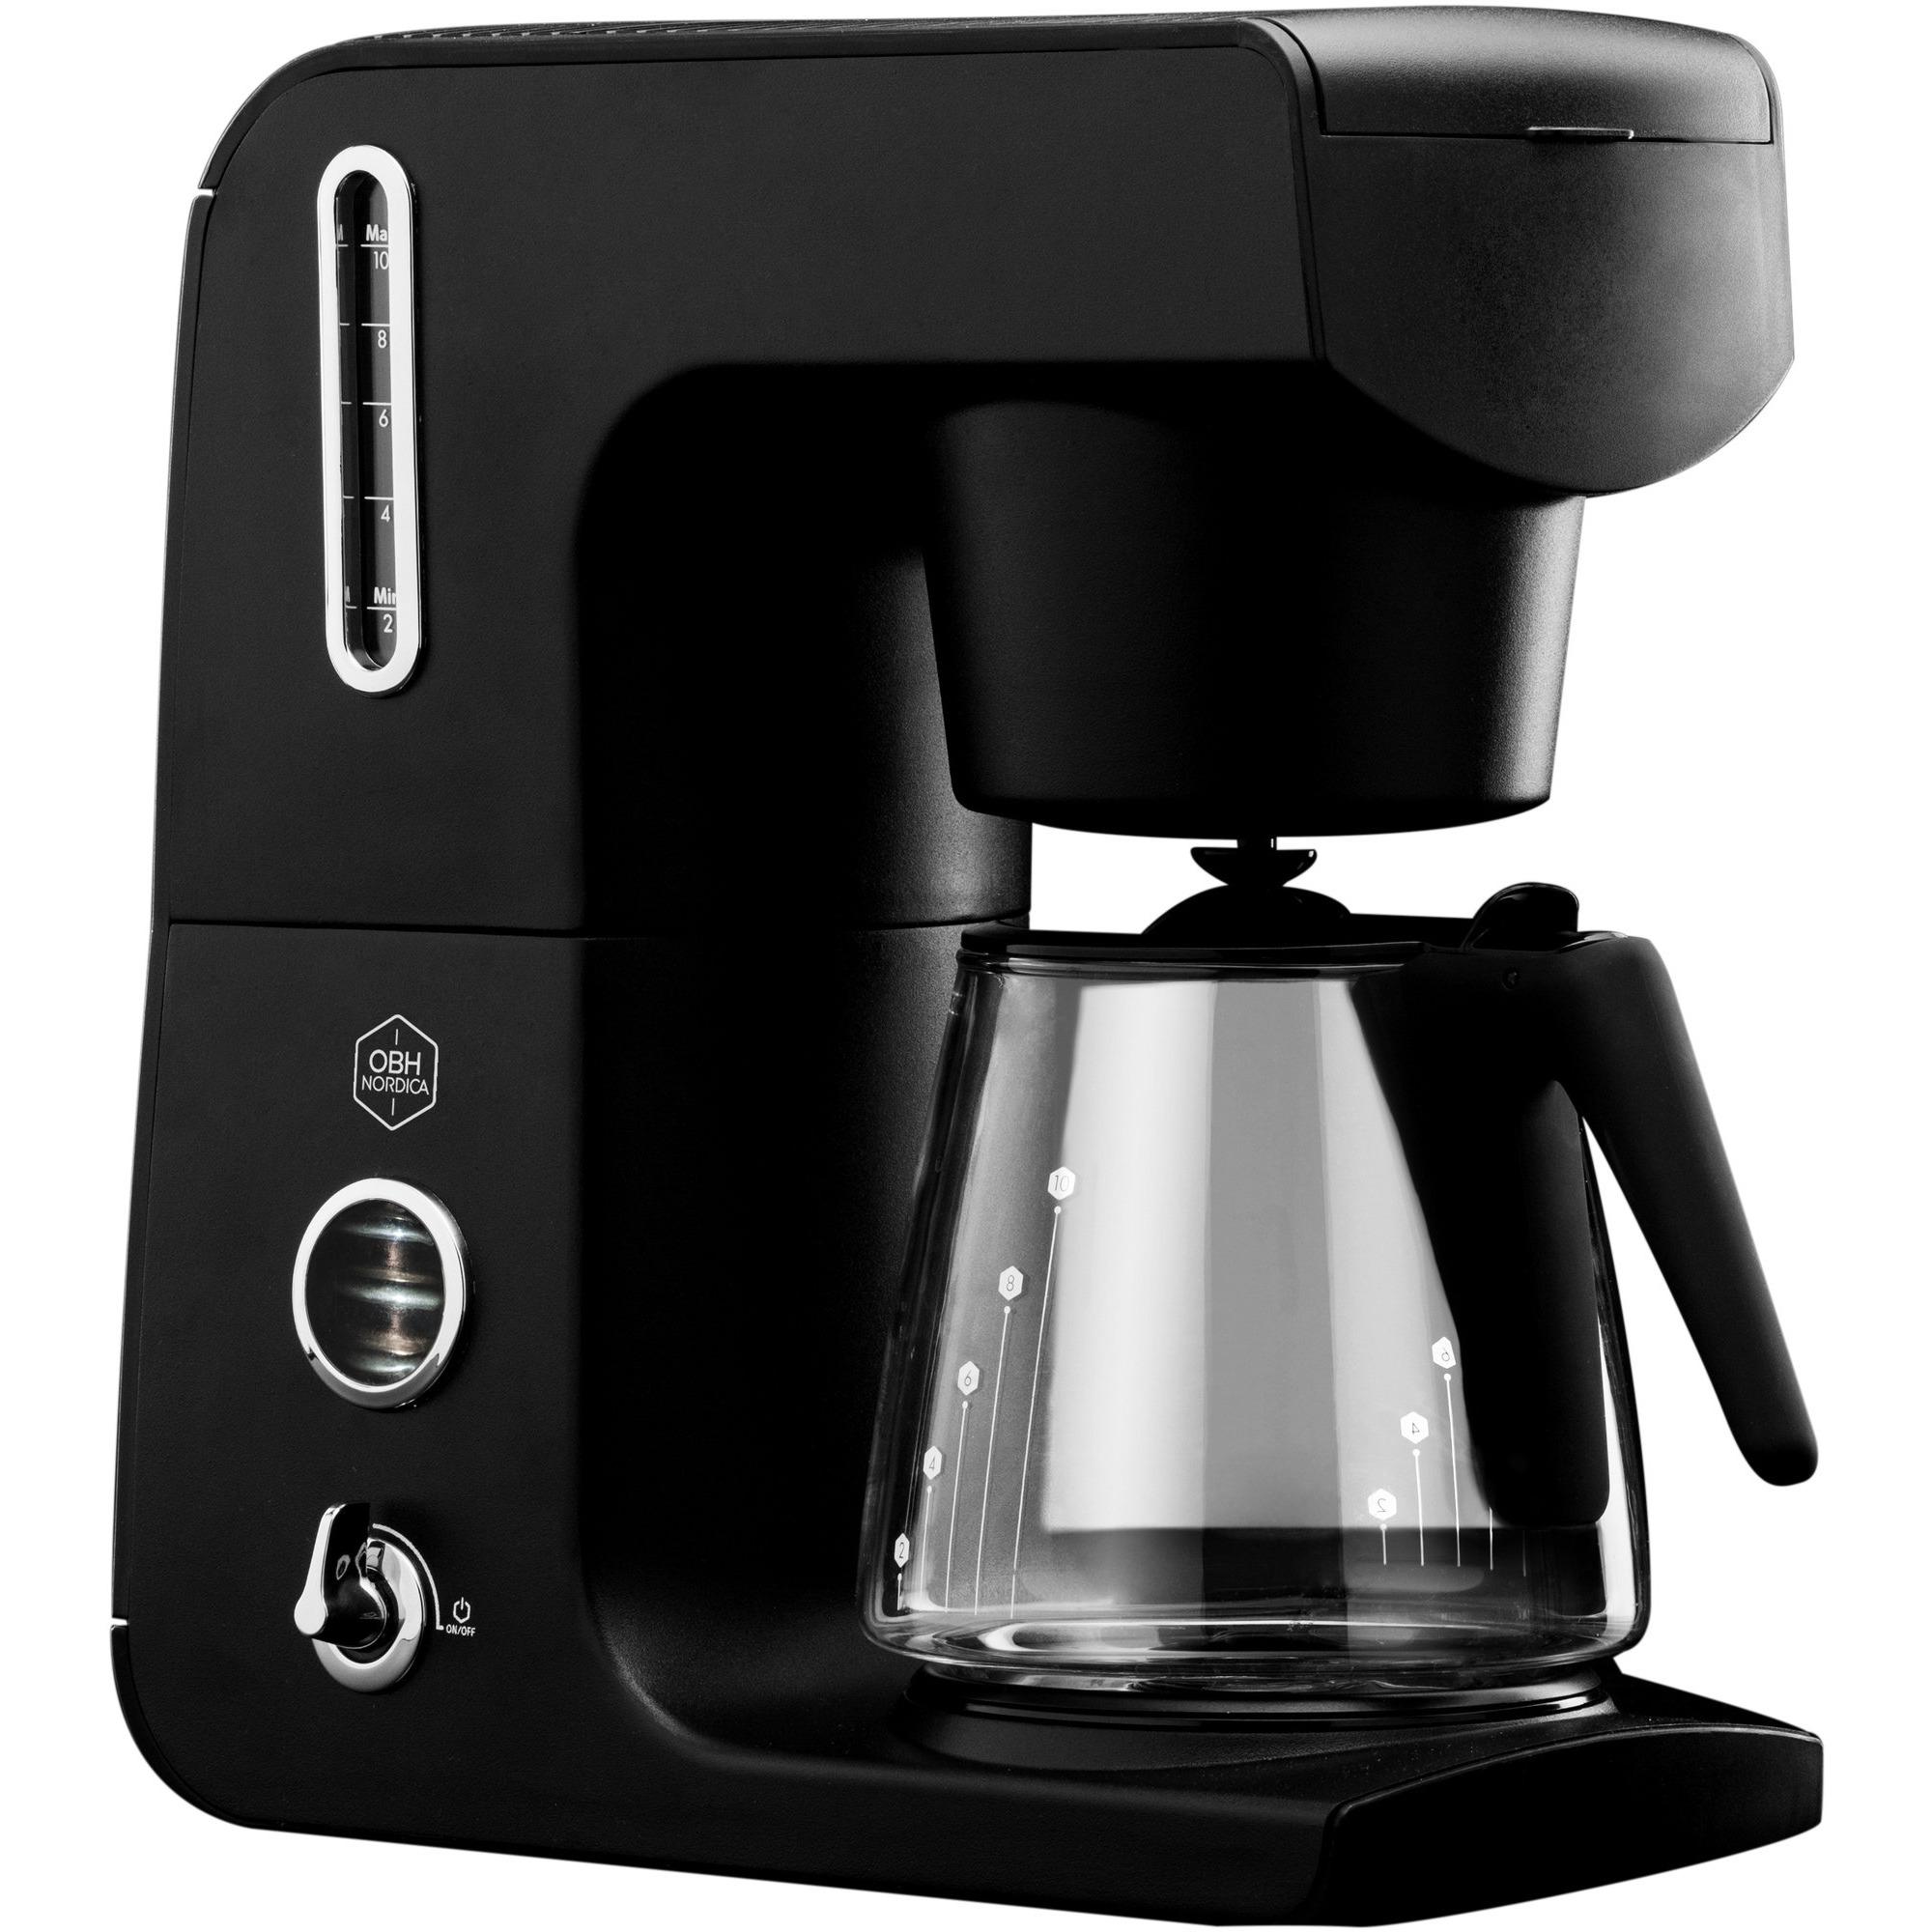 OBH LEGACY Kaffemaskine sort